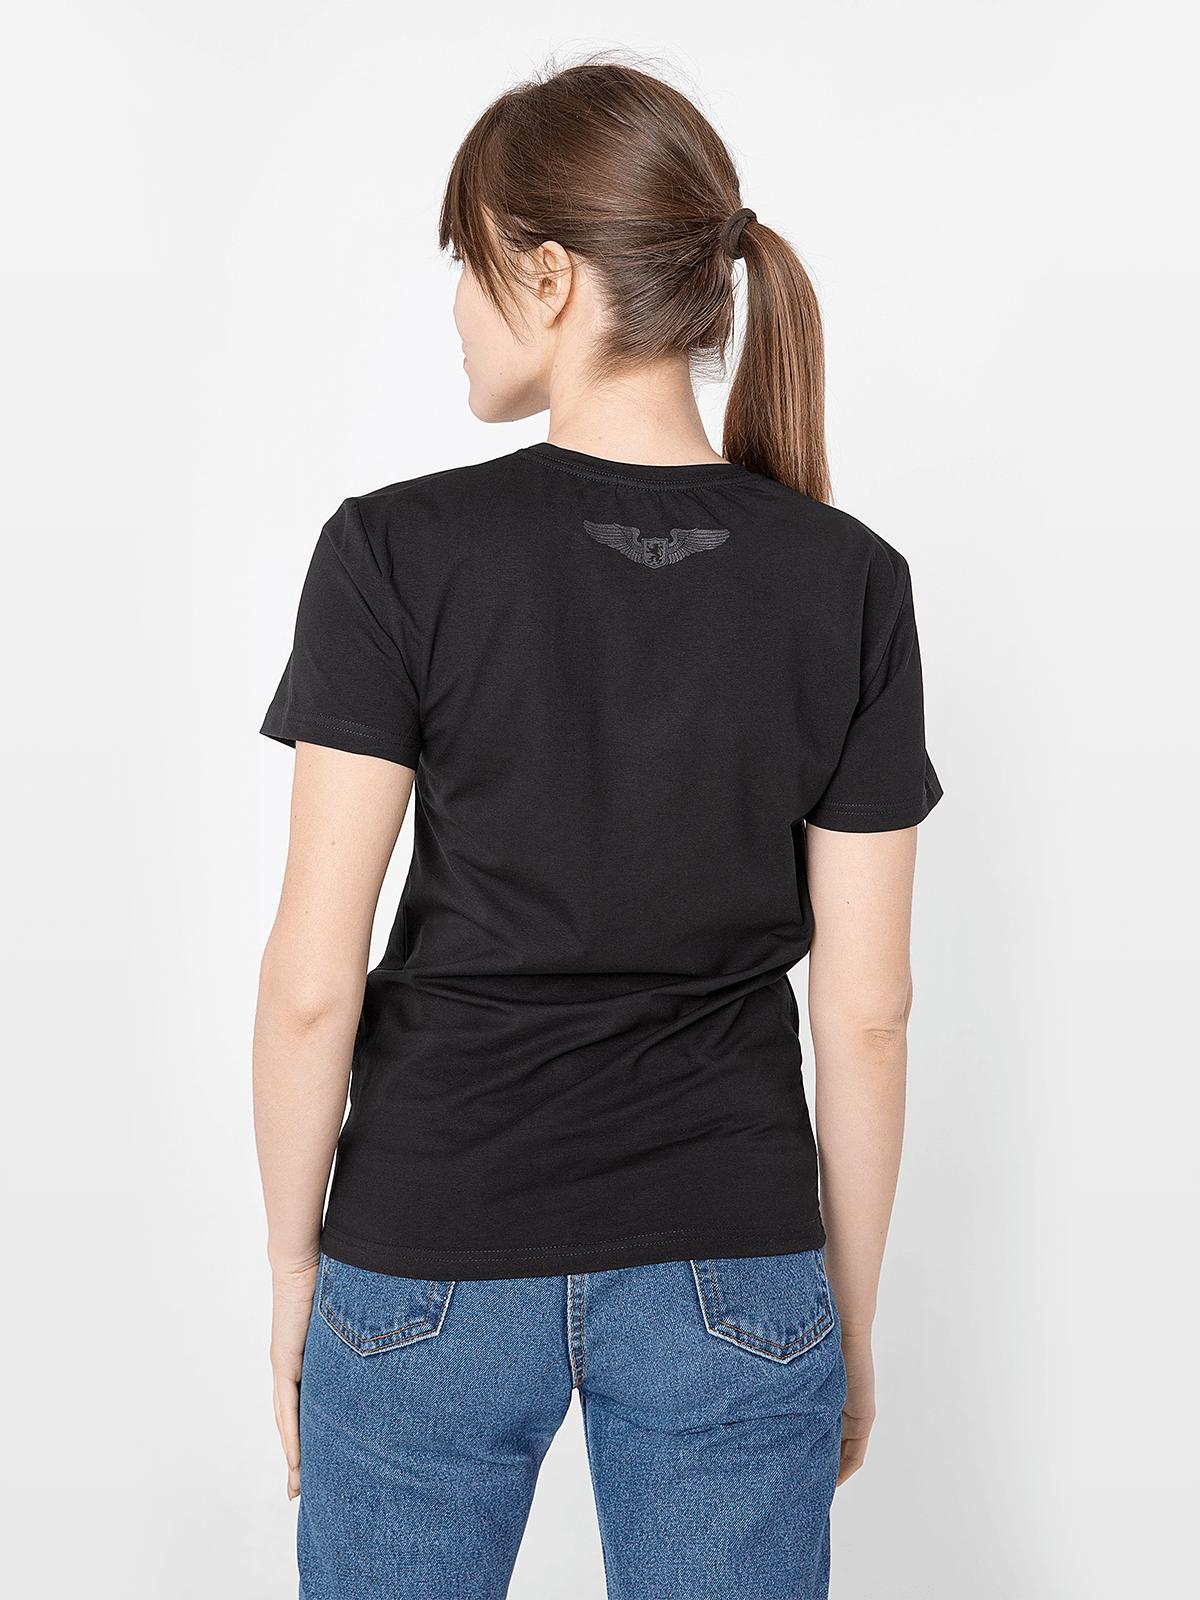 Women's T-Shirt Flu. Color black.  Technique of prints applied: silkscreen printing.